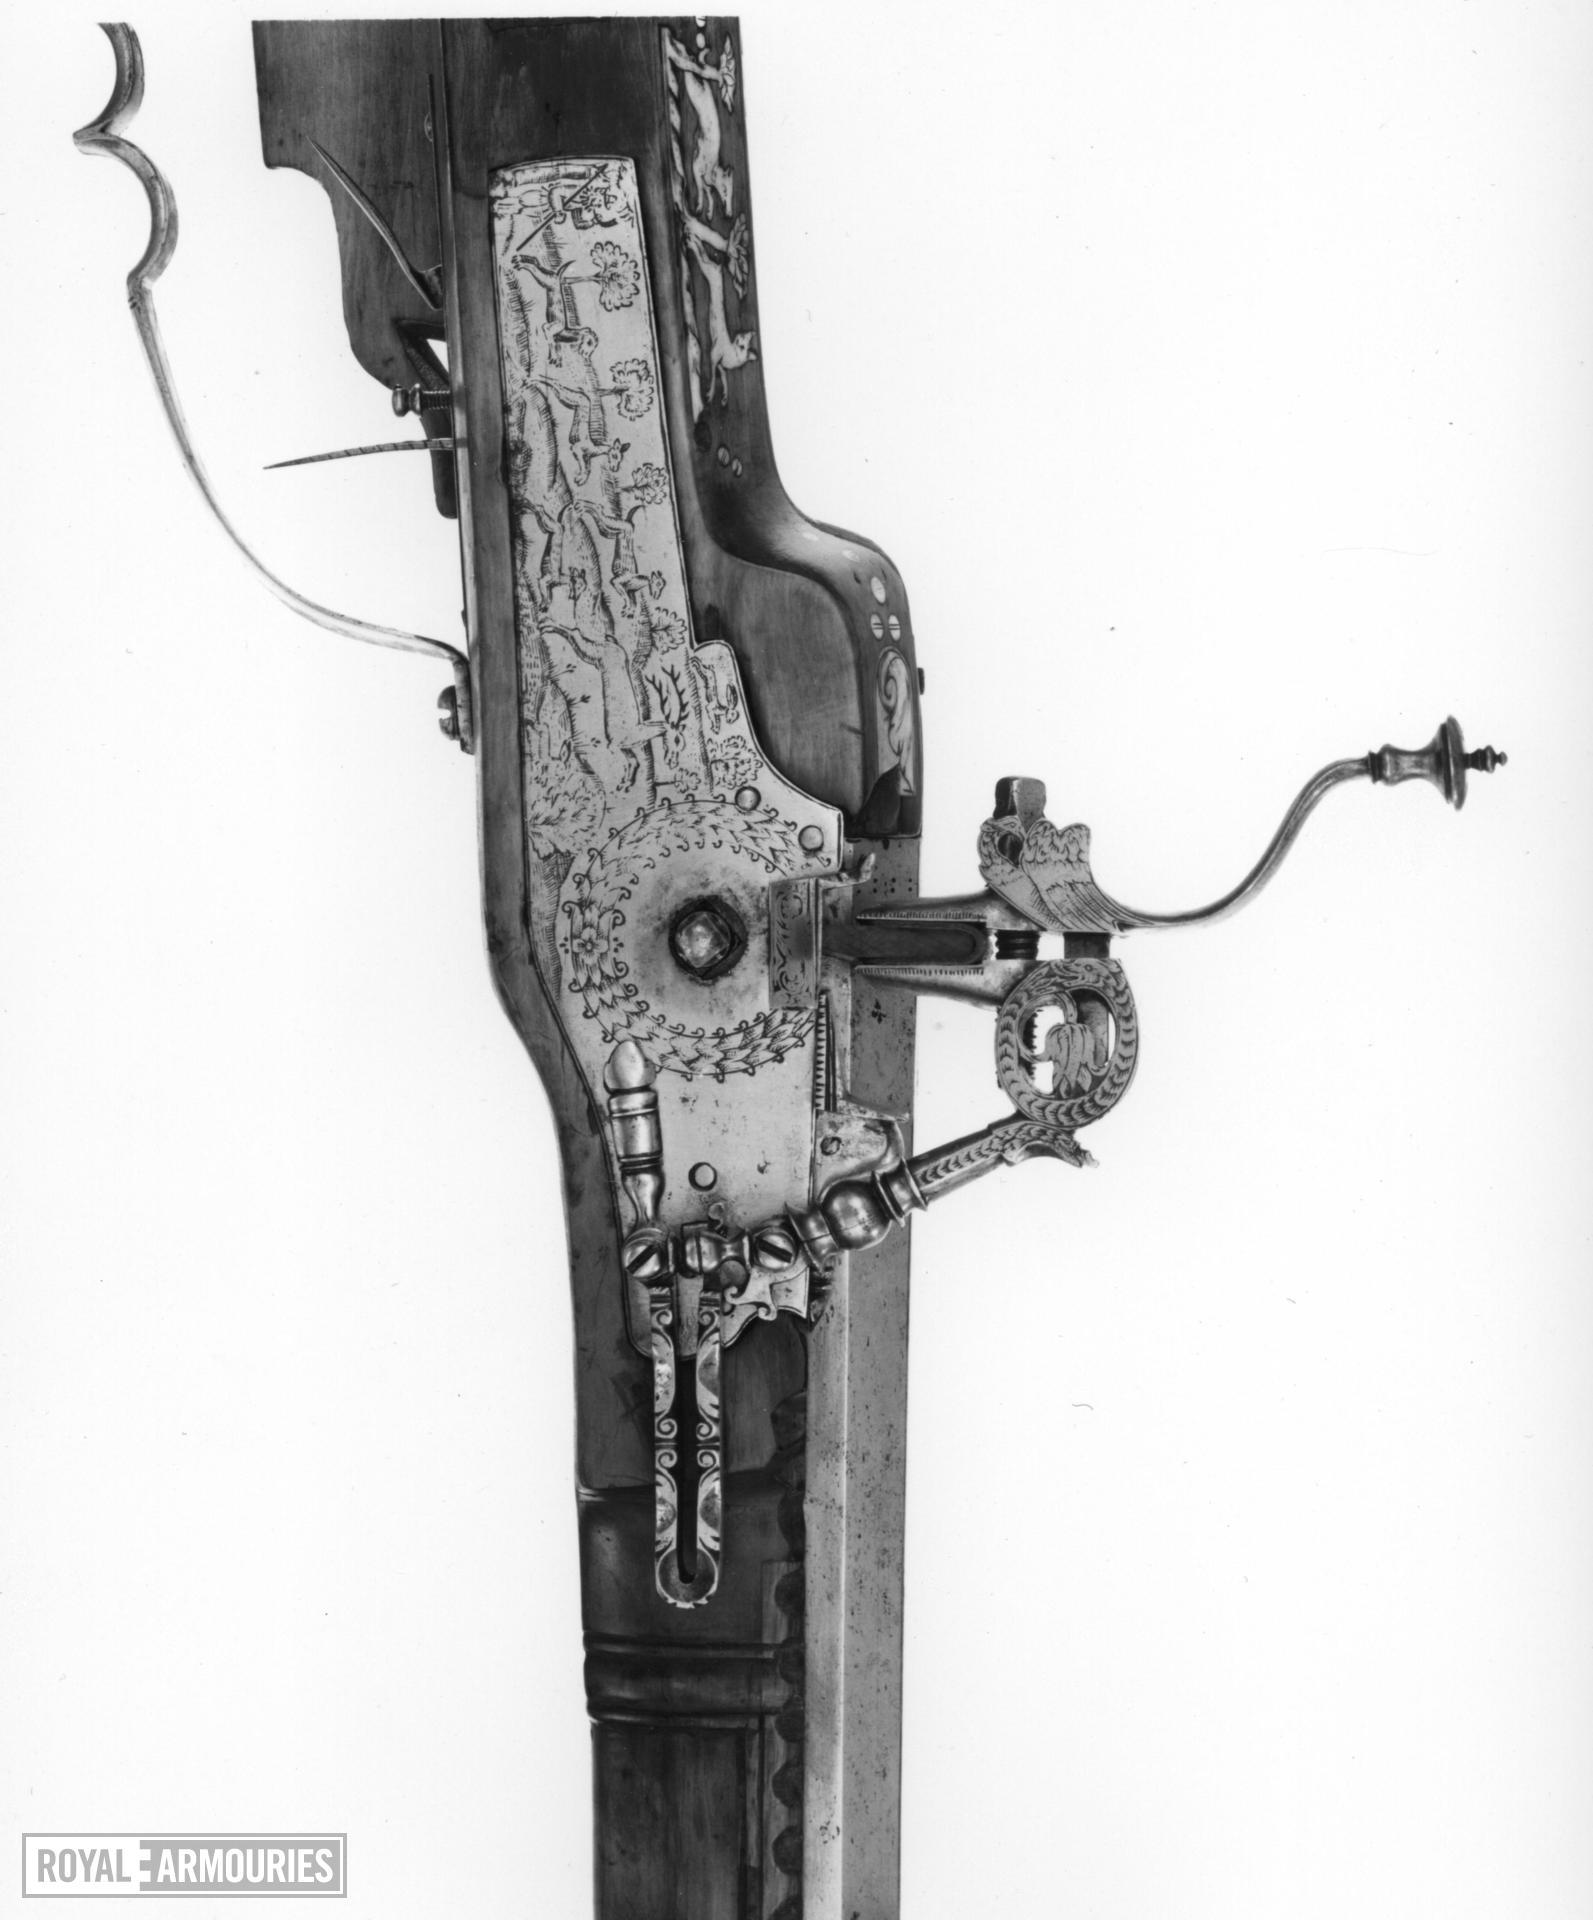 Wheellock muzzle-loading sporting rifle - By Samuel Dopfer